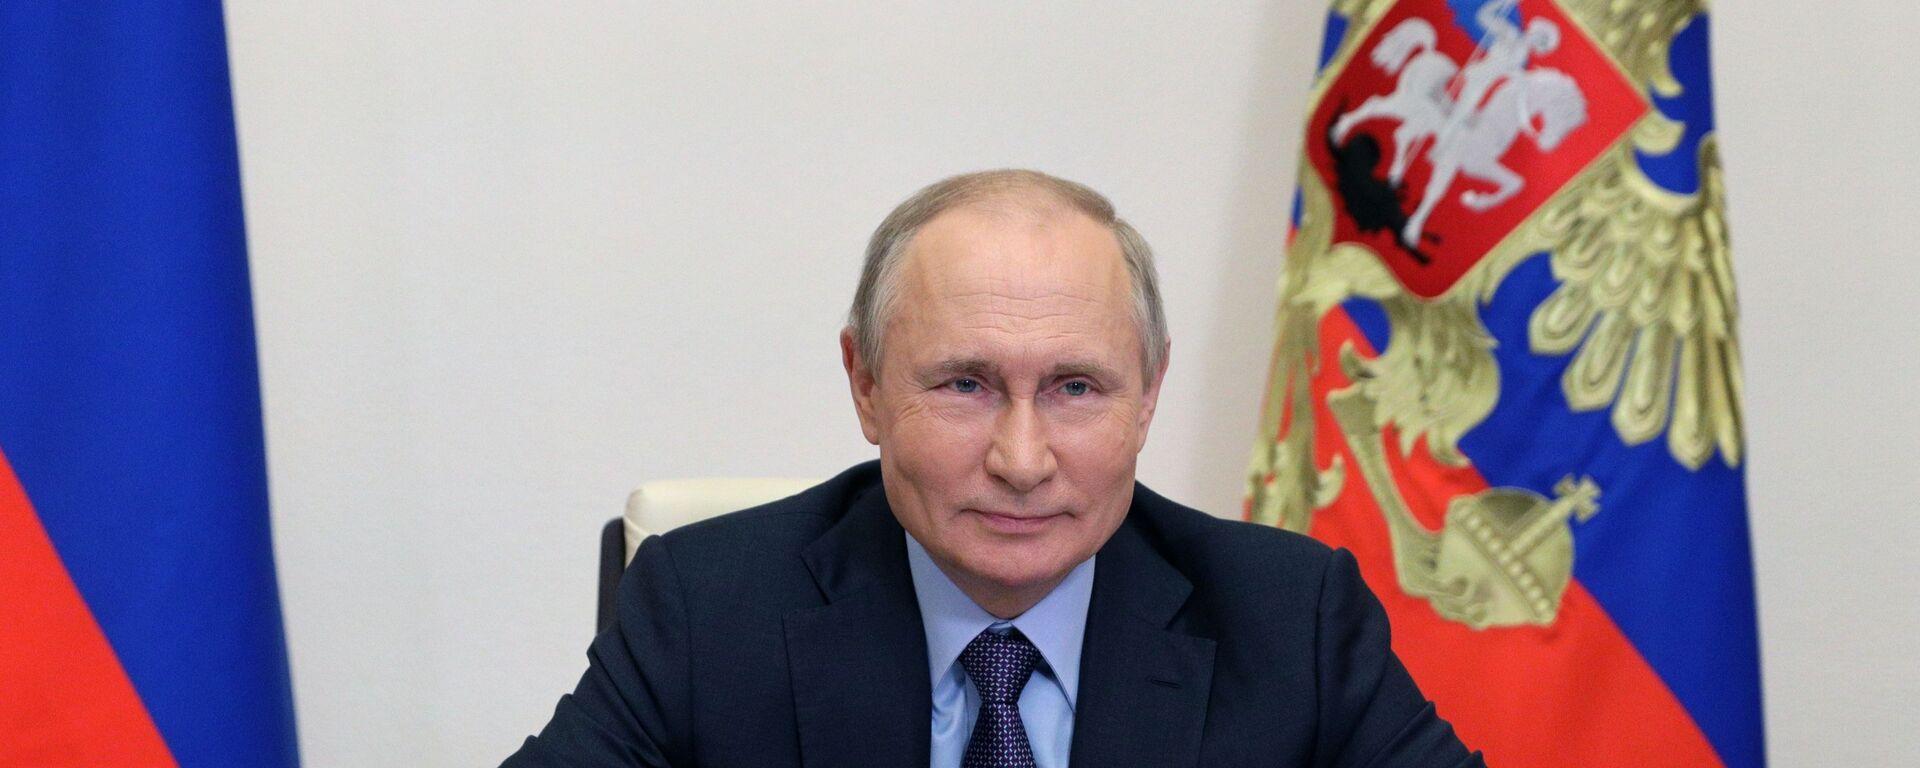 Ruski predsednik Vladimir Putin - Sputnik Srbija, 1920, 14.06.2021